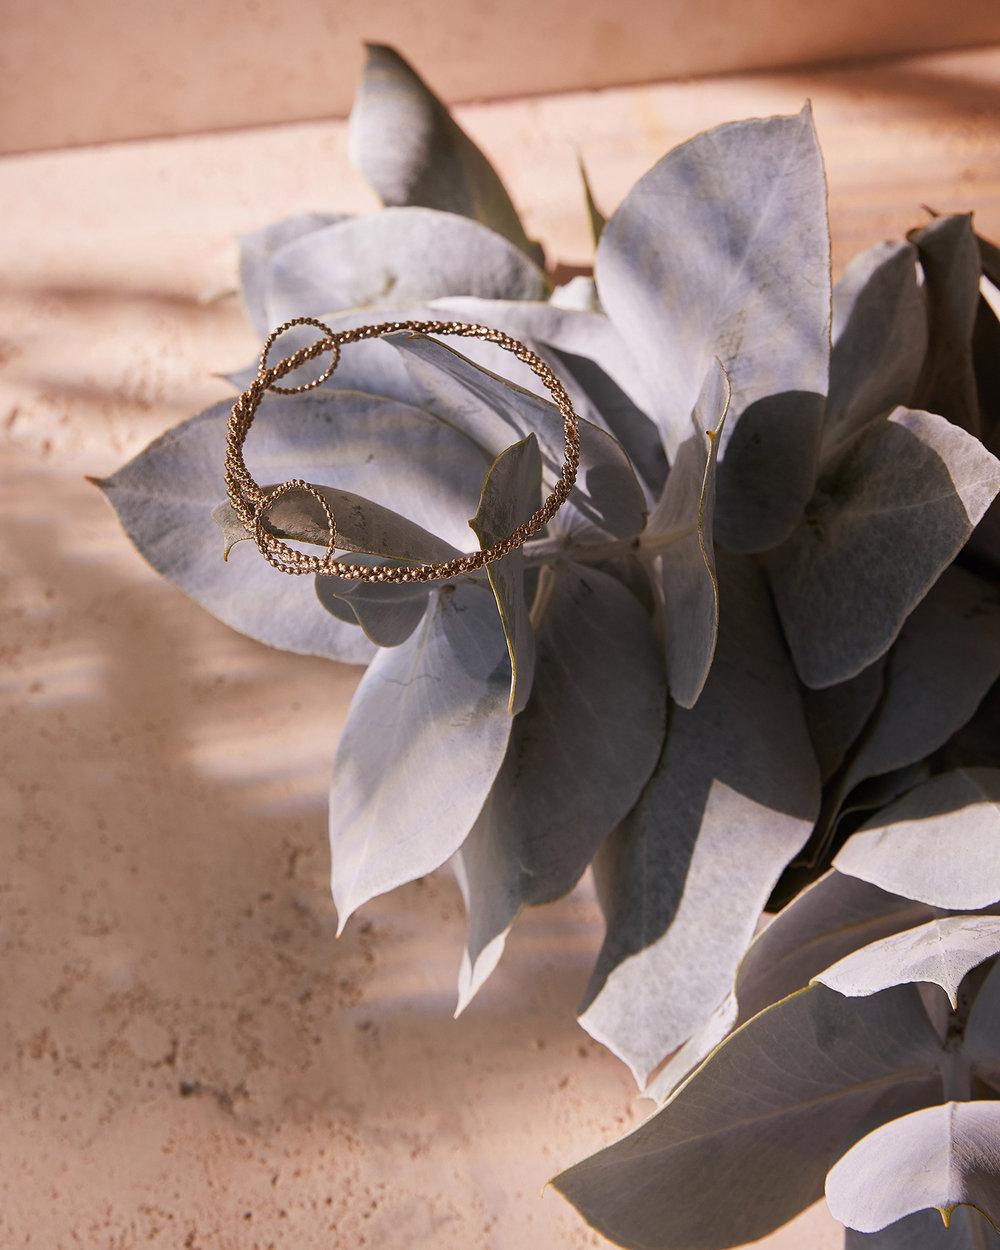 Macro_Australis_Botanica_Abby_Seymour_Jewellery_Brass_Seed-Garland_Bangle_2018.jpg